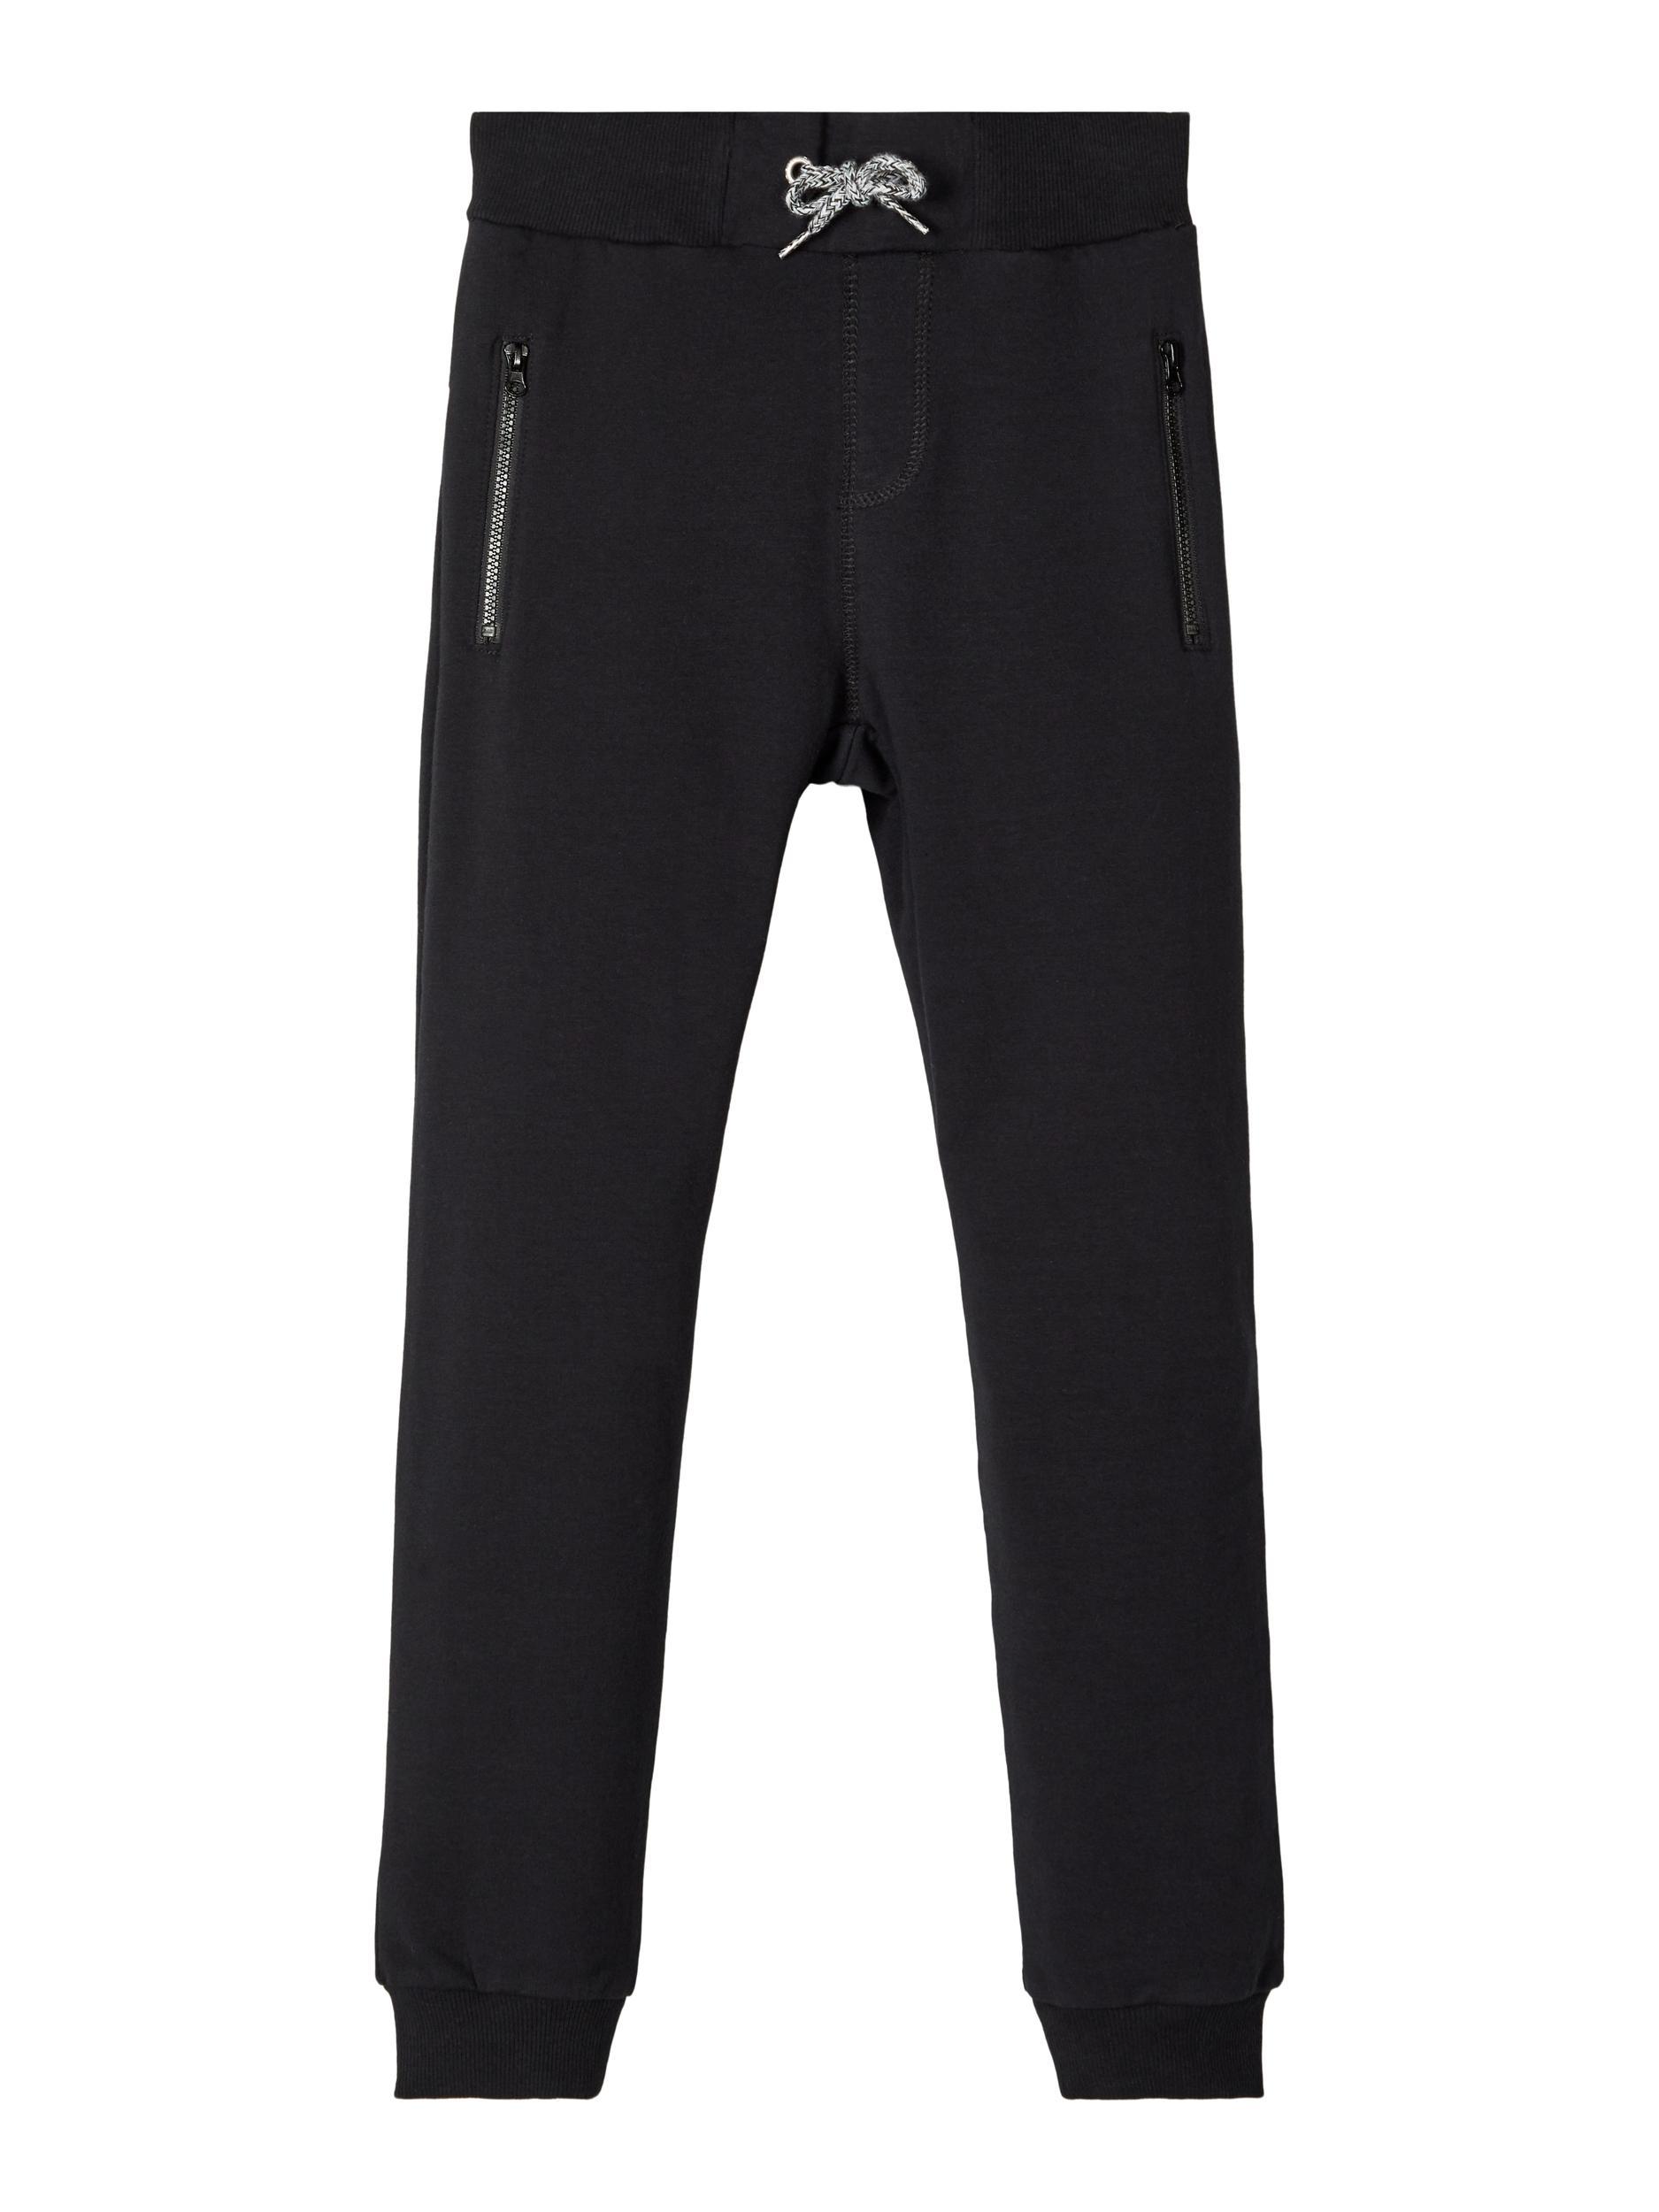 Name It Ensfarvede sweatpants, black, 86